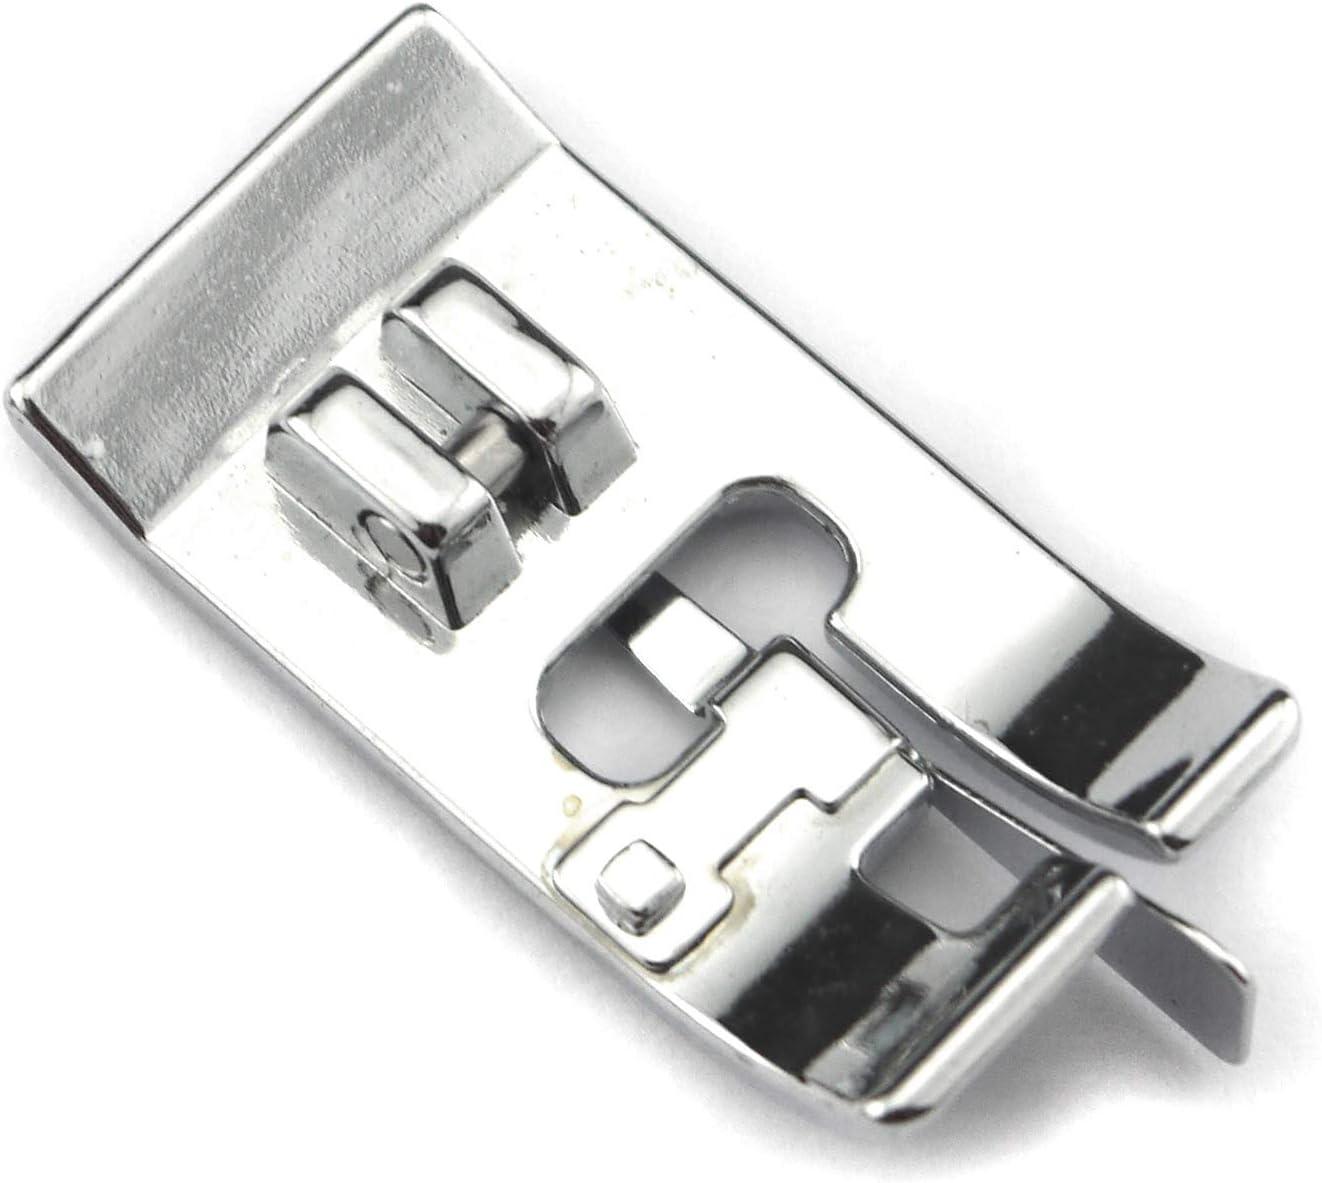 DREAMSTITCH 255SP - Prensatelas para máquina de coser Singer 255SP ...